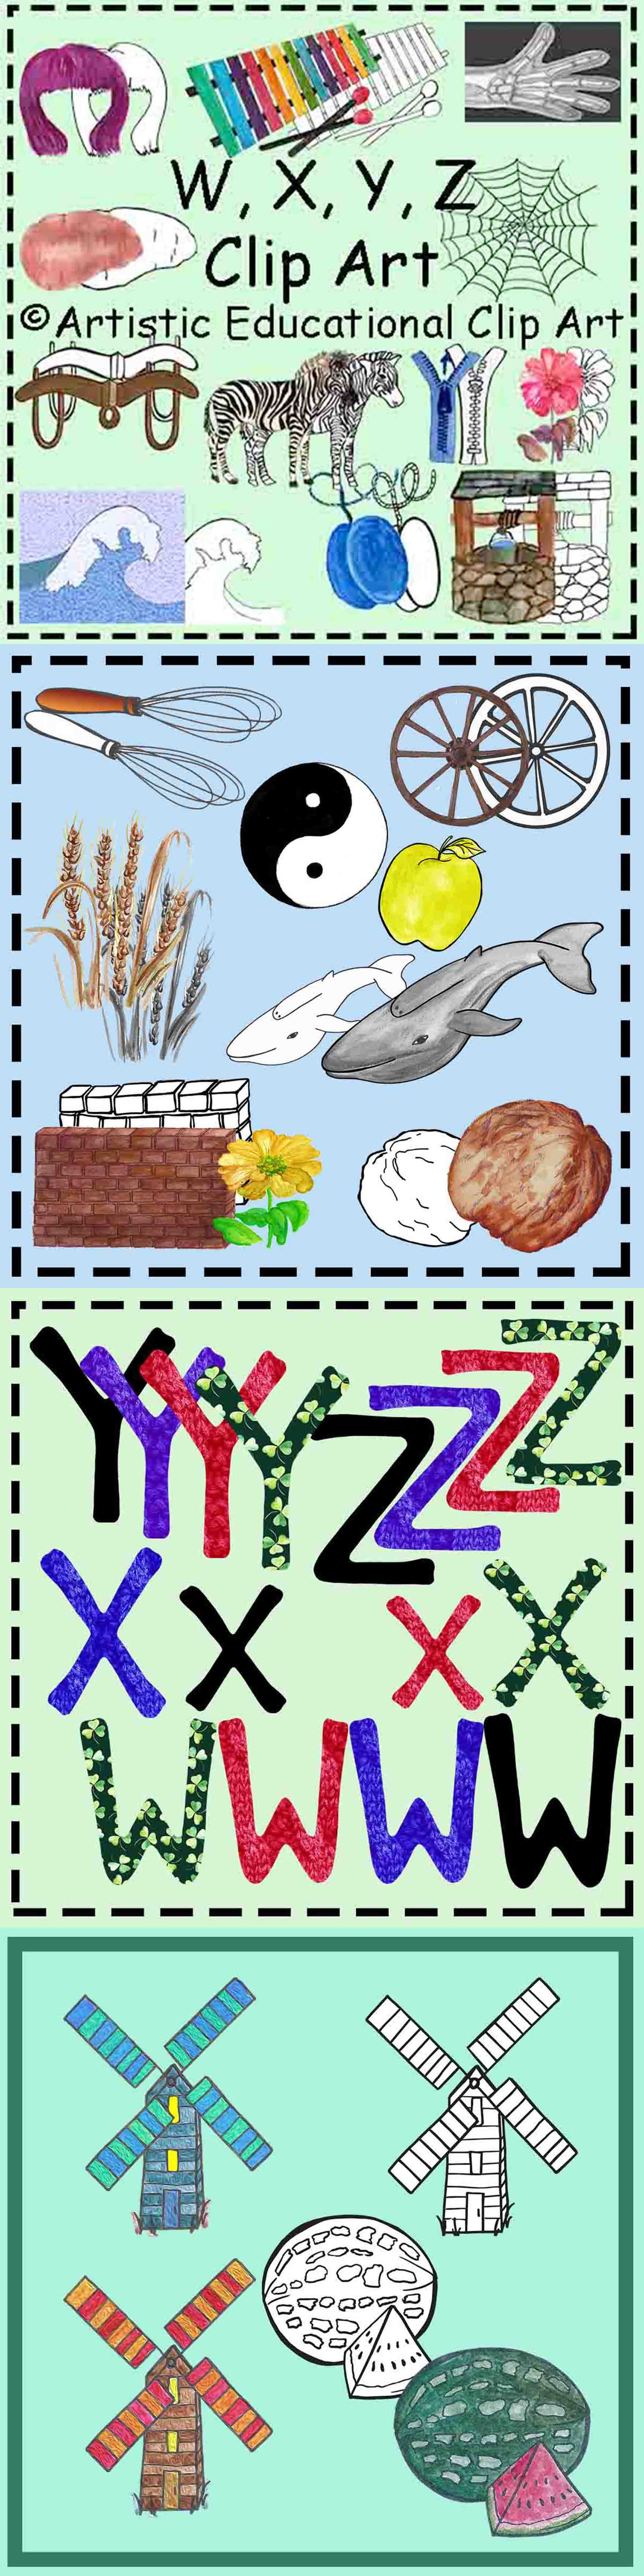 Q U V W X Y Z Wh Clip Art Initial Sounds Realistic